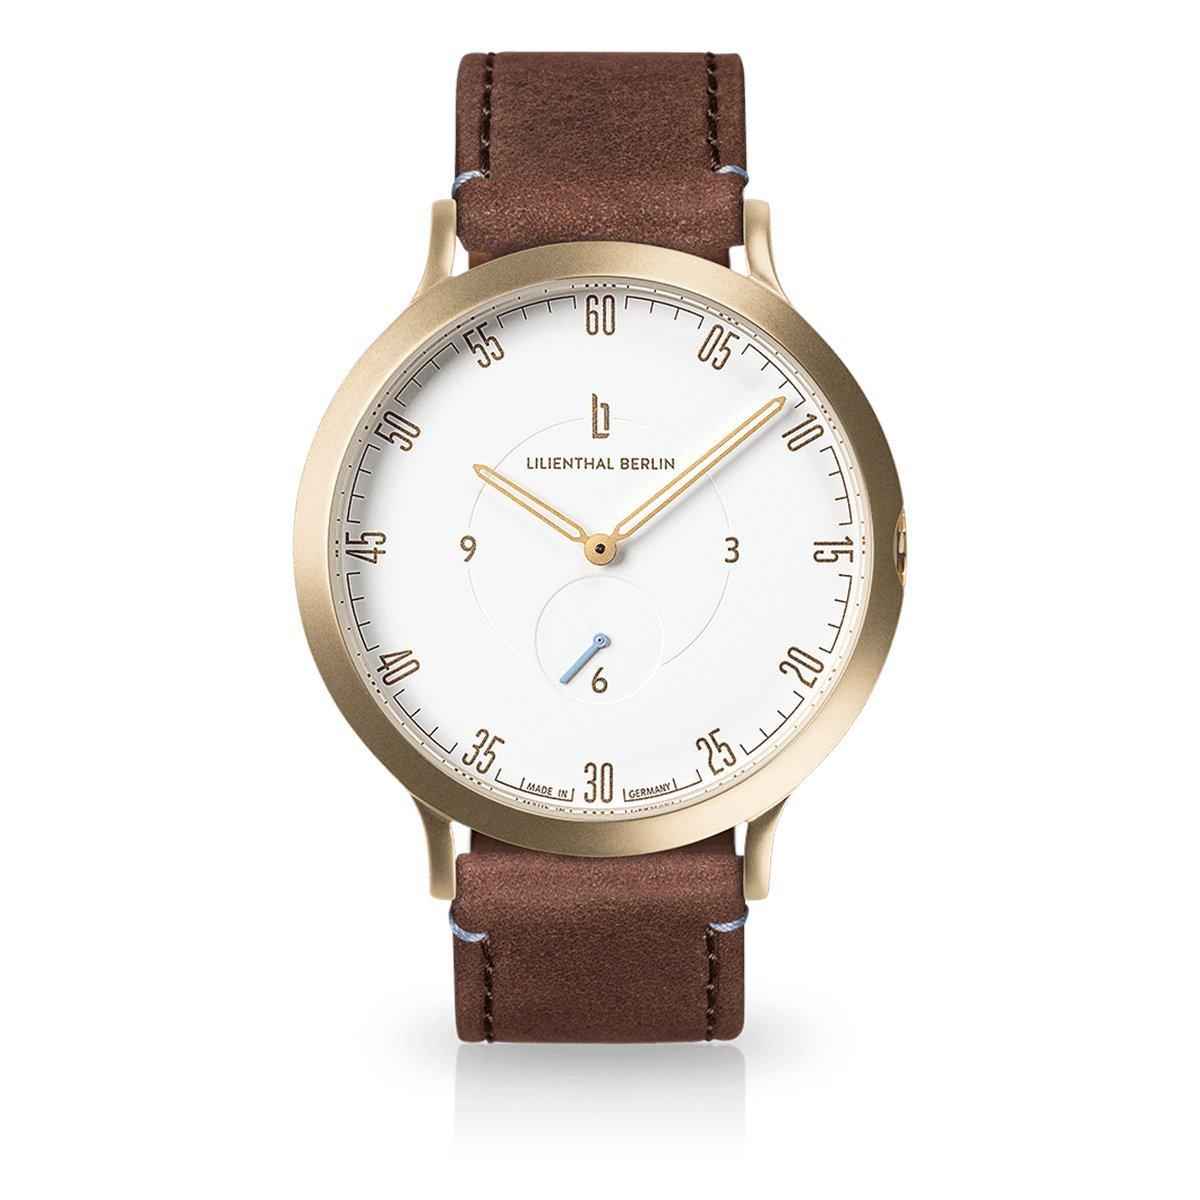 Lilienthal Berlin -Made in Germany- ベルリンの新しい時計モデル L1 ステンレススチール ケース B01MQLTTZO サイズ: 37.5 mm|ケース: ゴールド/ ダイアル: ホワイト/ ストラップ: ブラウン ケース: ゴールド/ ダイアル: ホワイト/ ストラップ: ブラウン サイズ: 37.5 mm